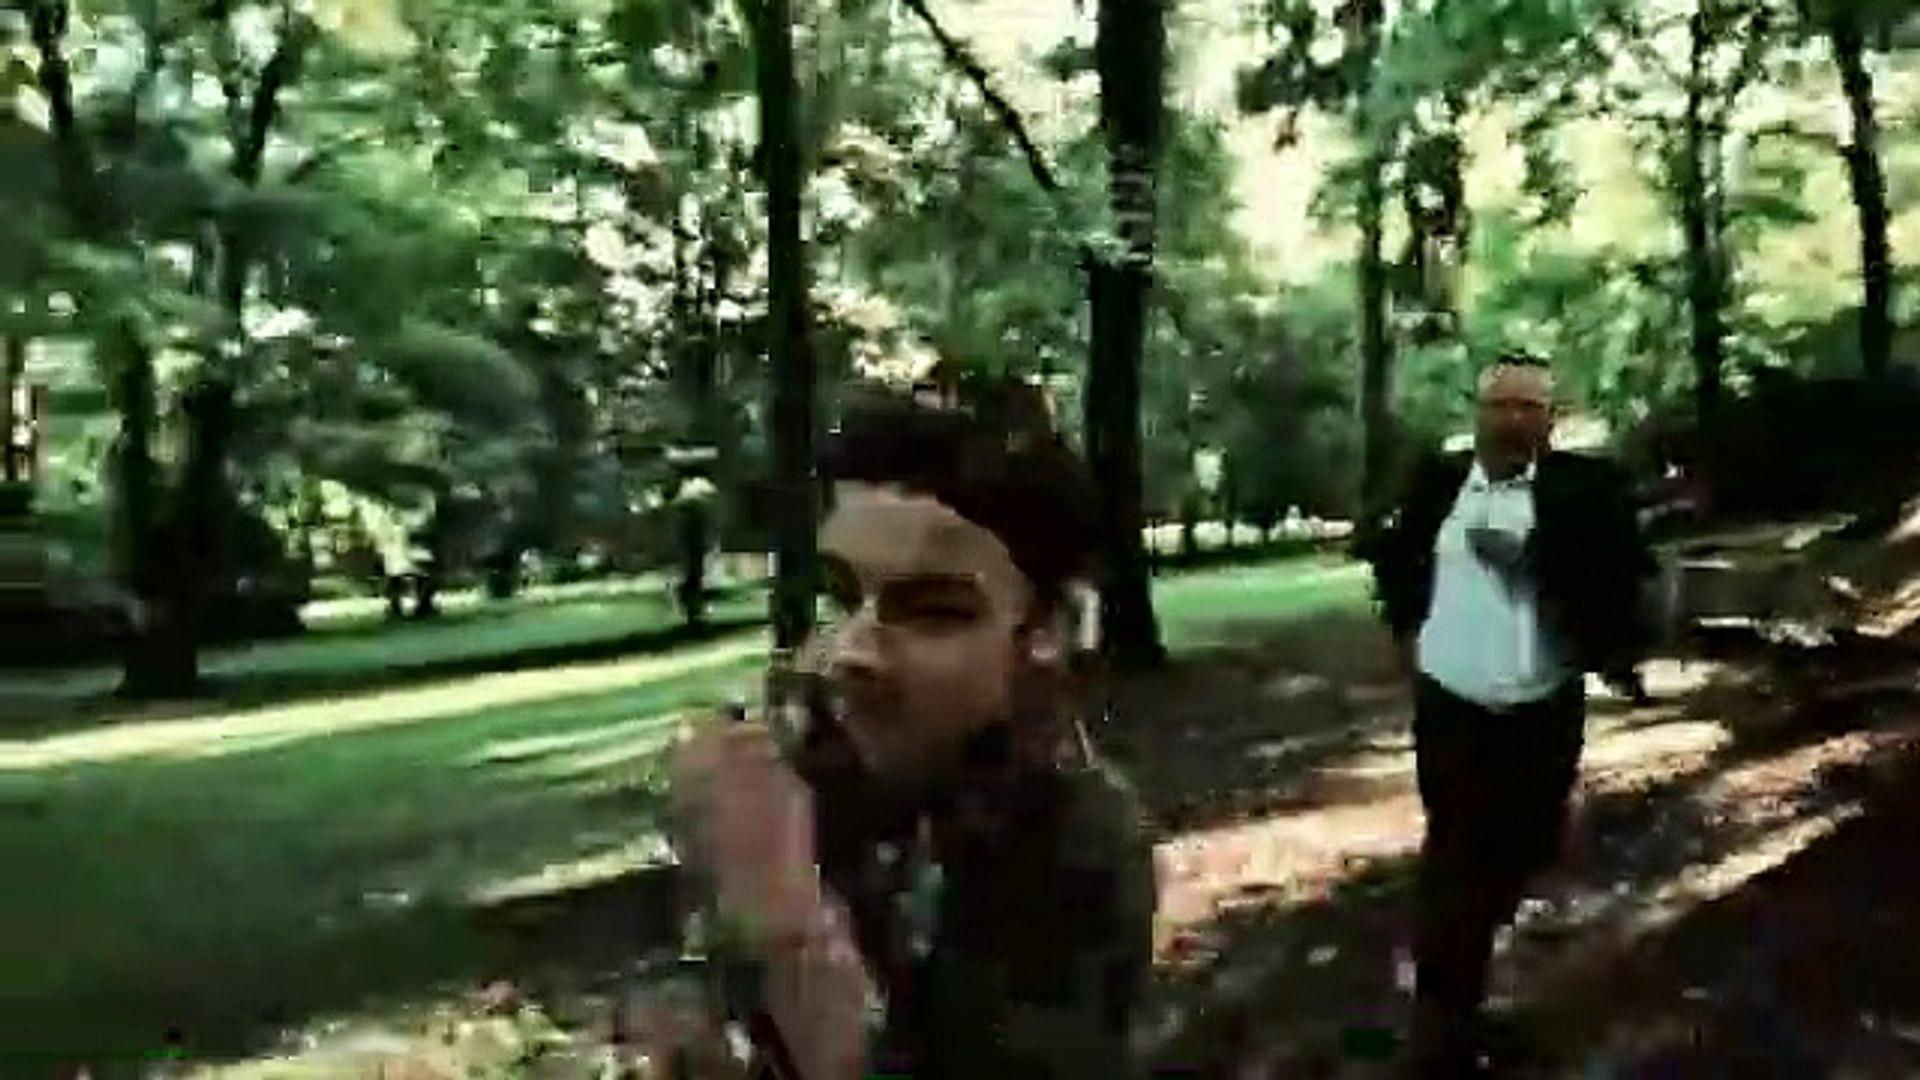 Wing_Chun Motivational Video